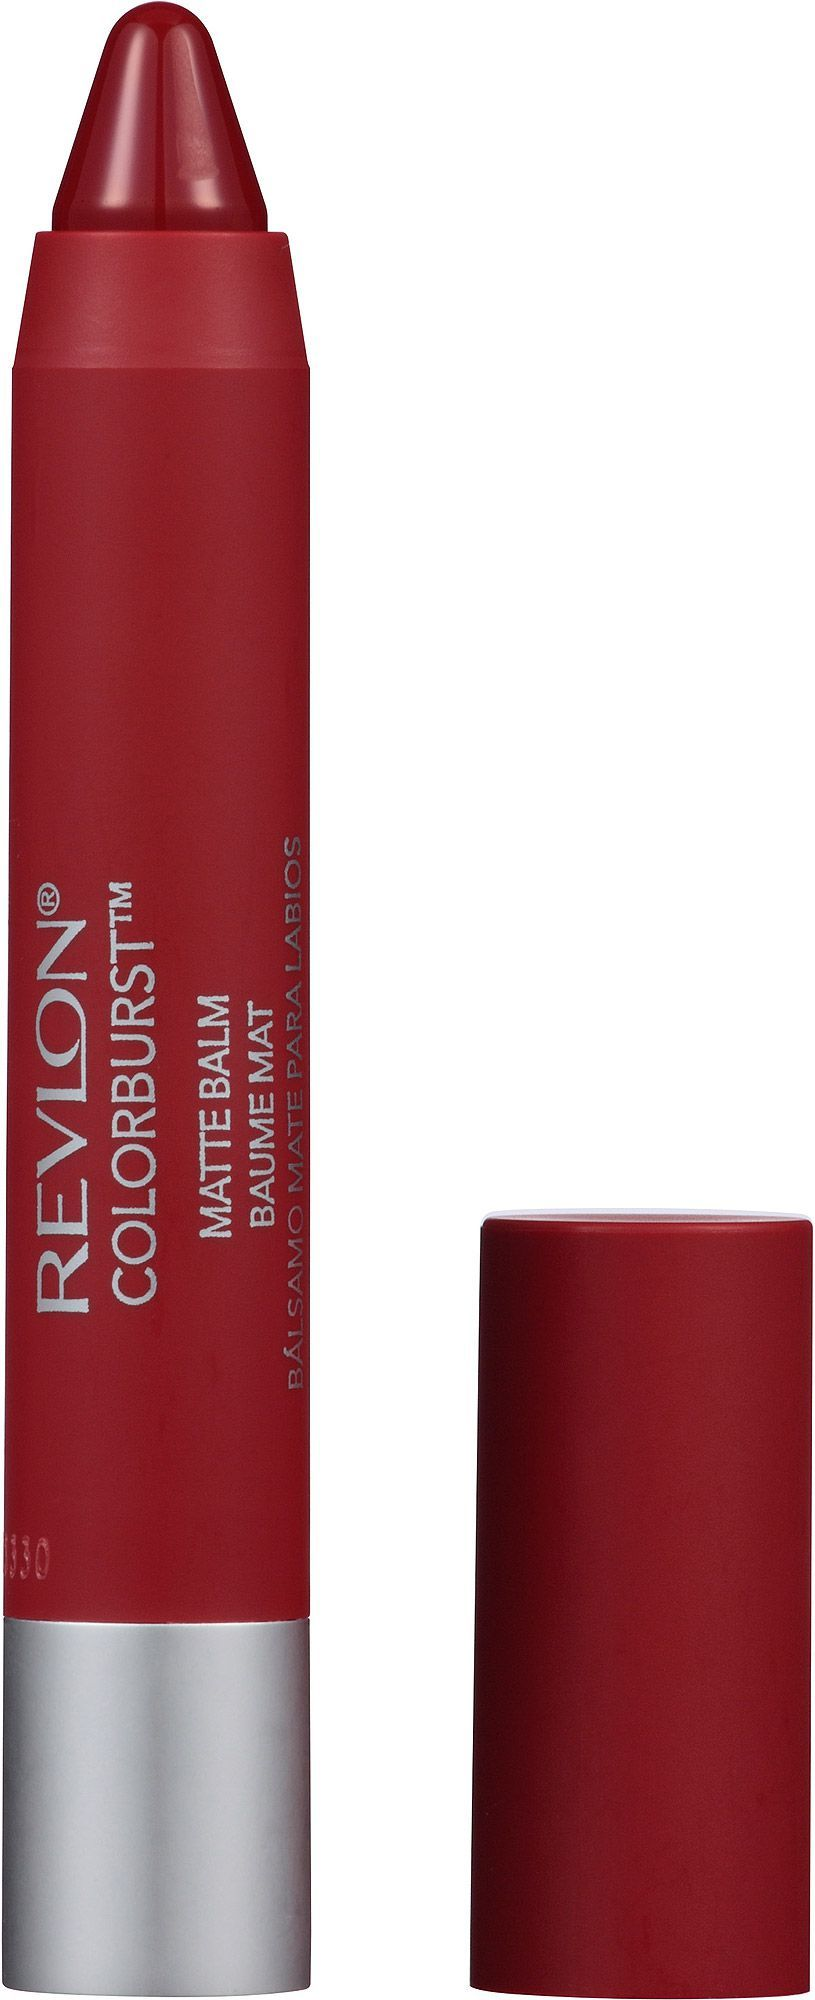 Revlon ColorBurst Matte Balm matowy balsam do ust 250 Standout 2.7g 1